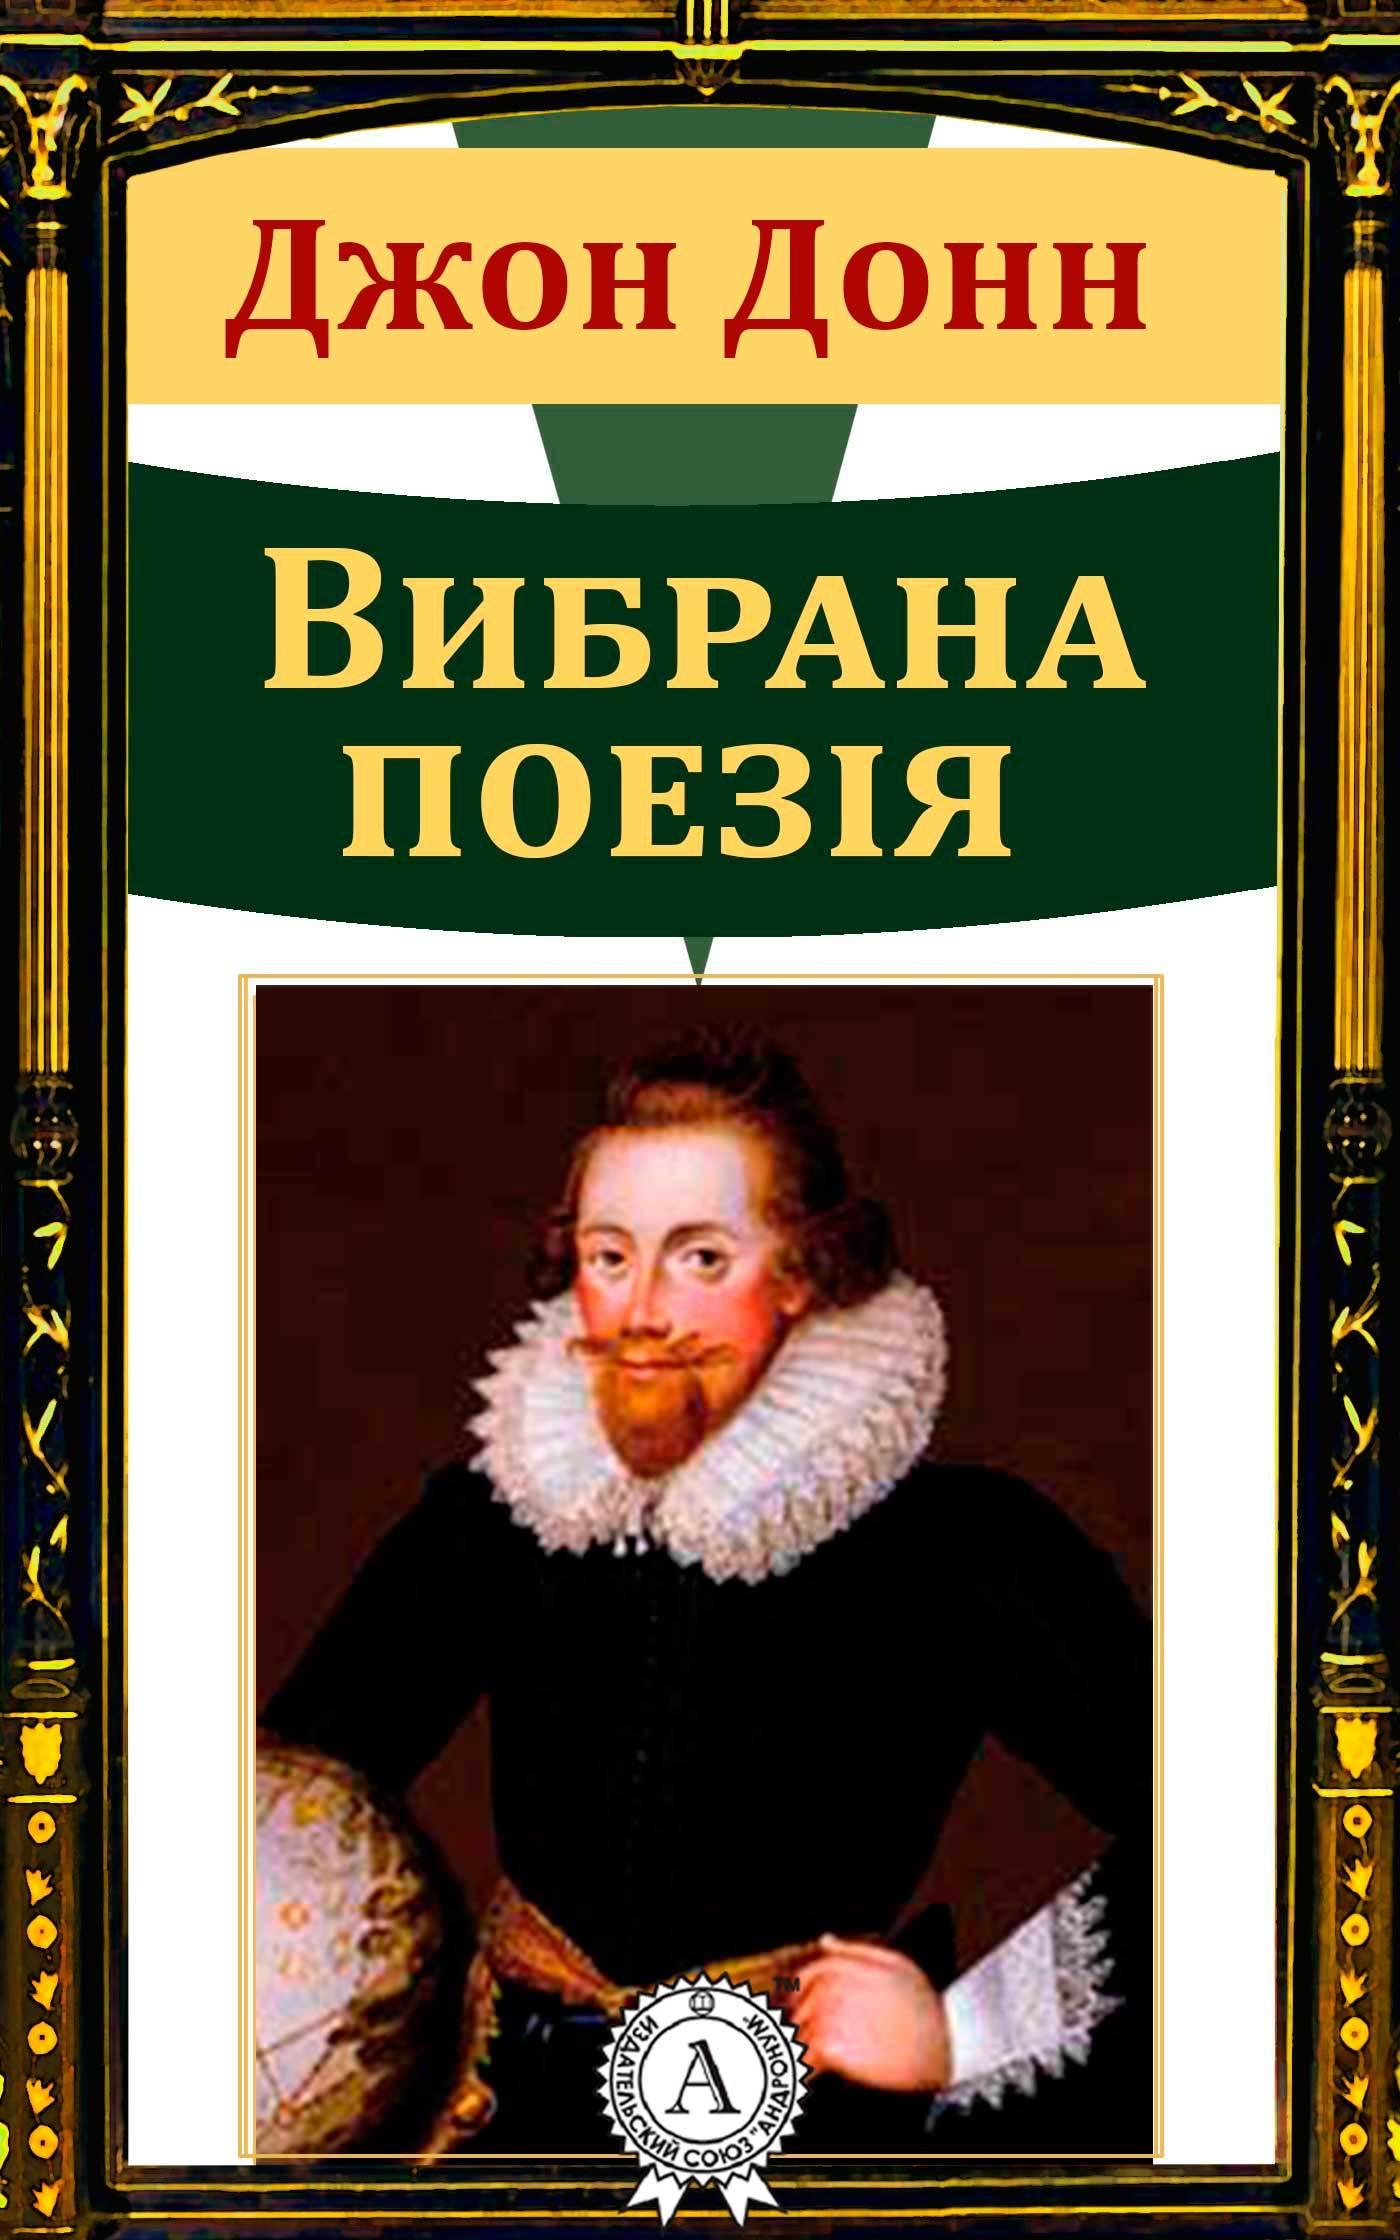 Джон Донн Джон Донн Вибрана поезія джон донн священные сонеты